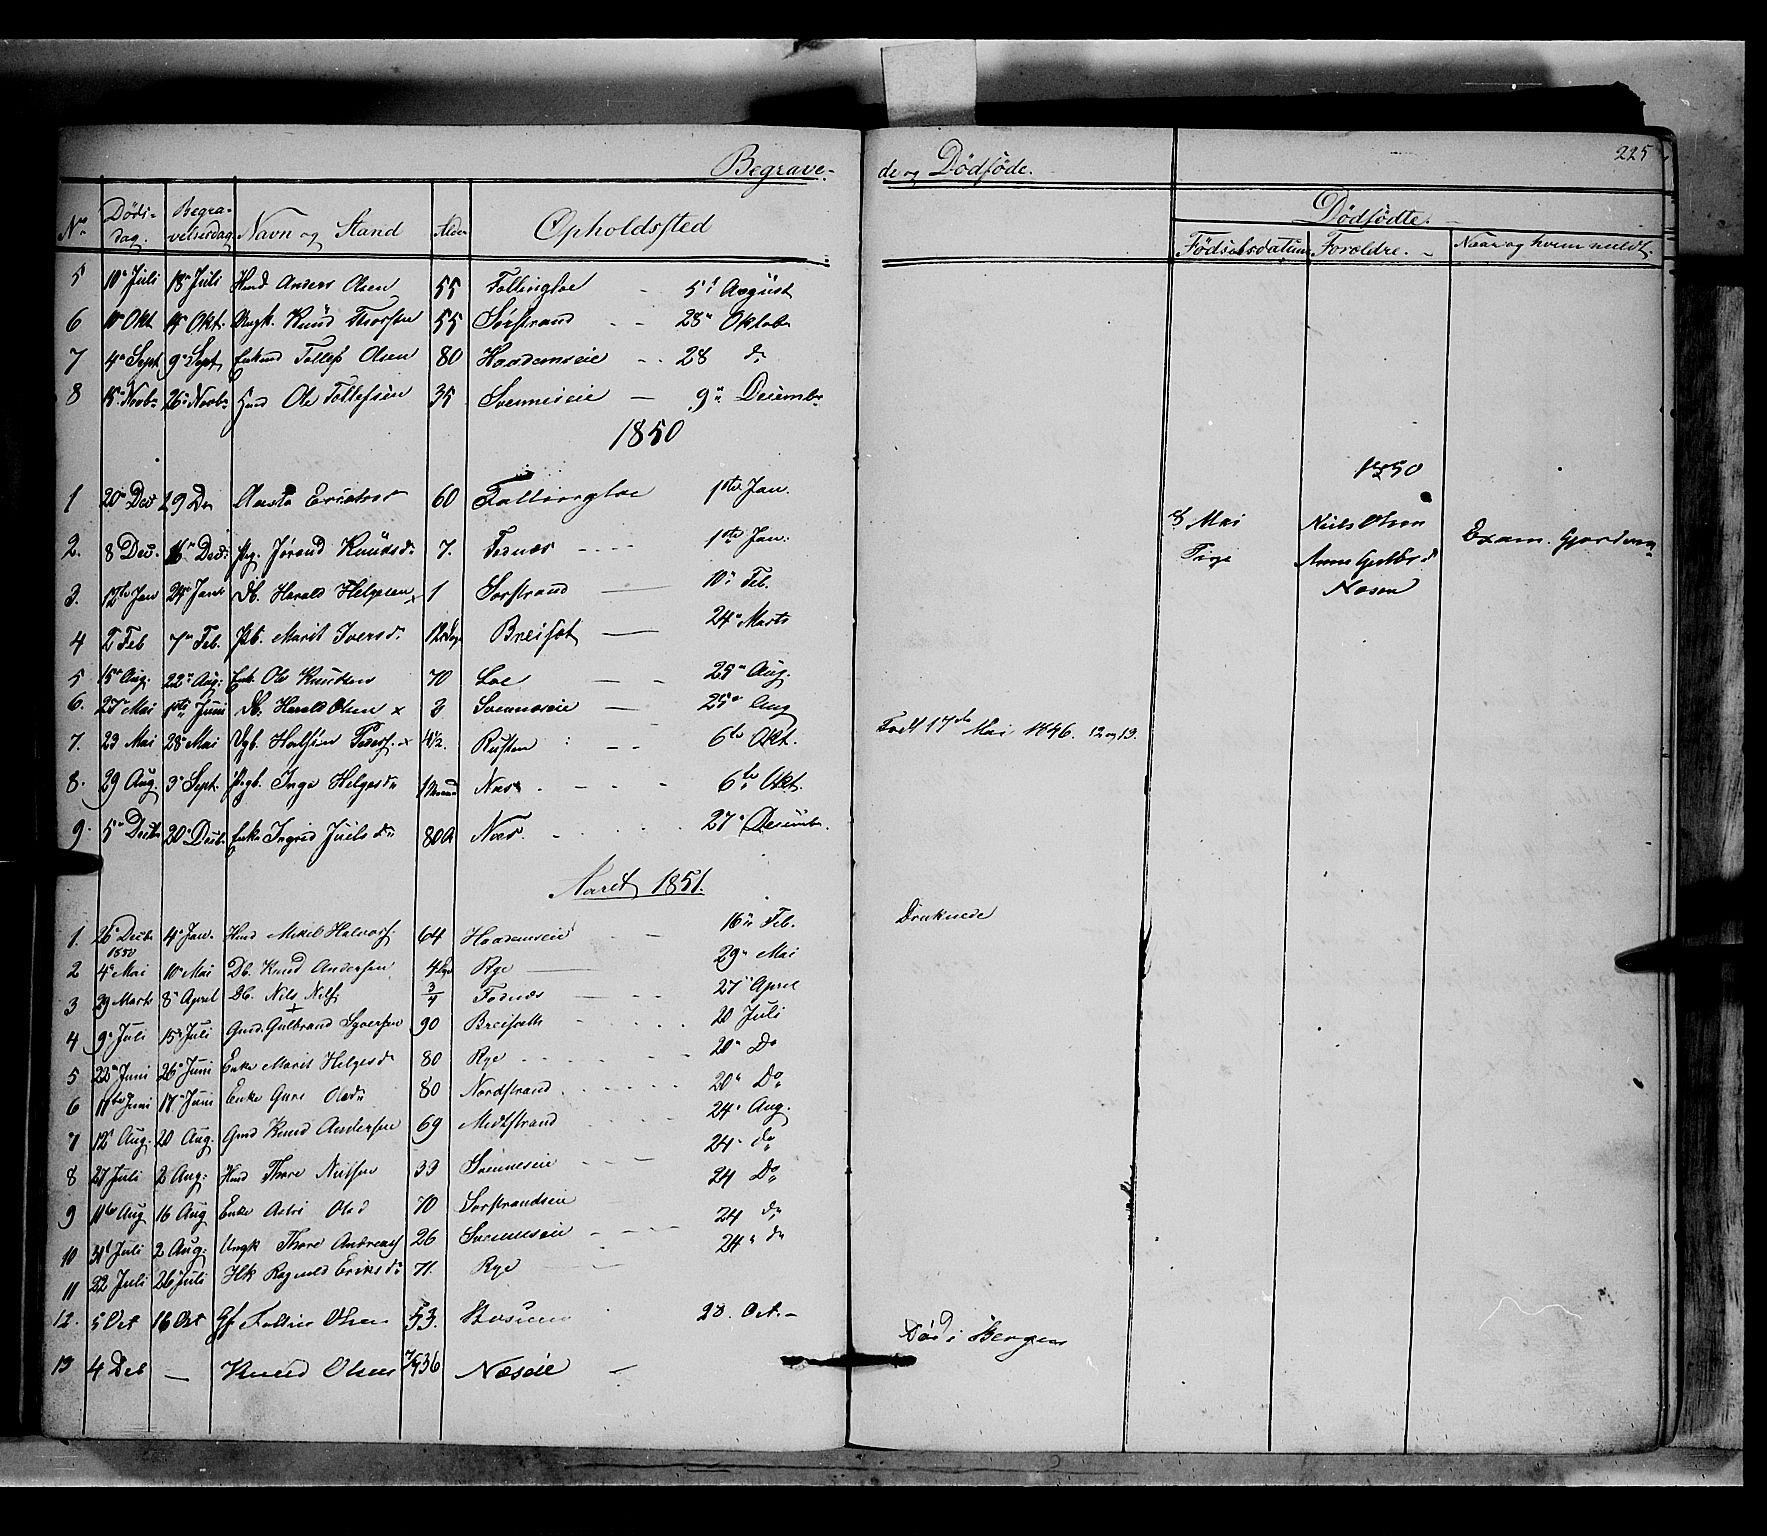 SAH, Nord-Aurdal prestekontor, Ministerialbok nr. 5, 1842-1863, s. 225